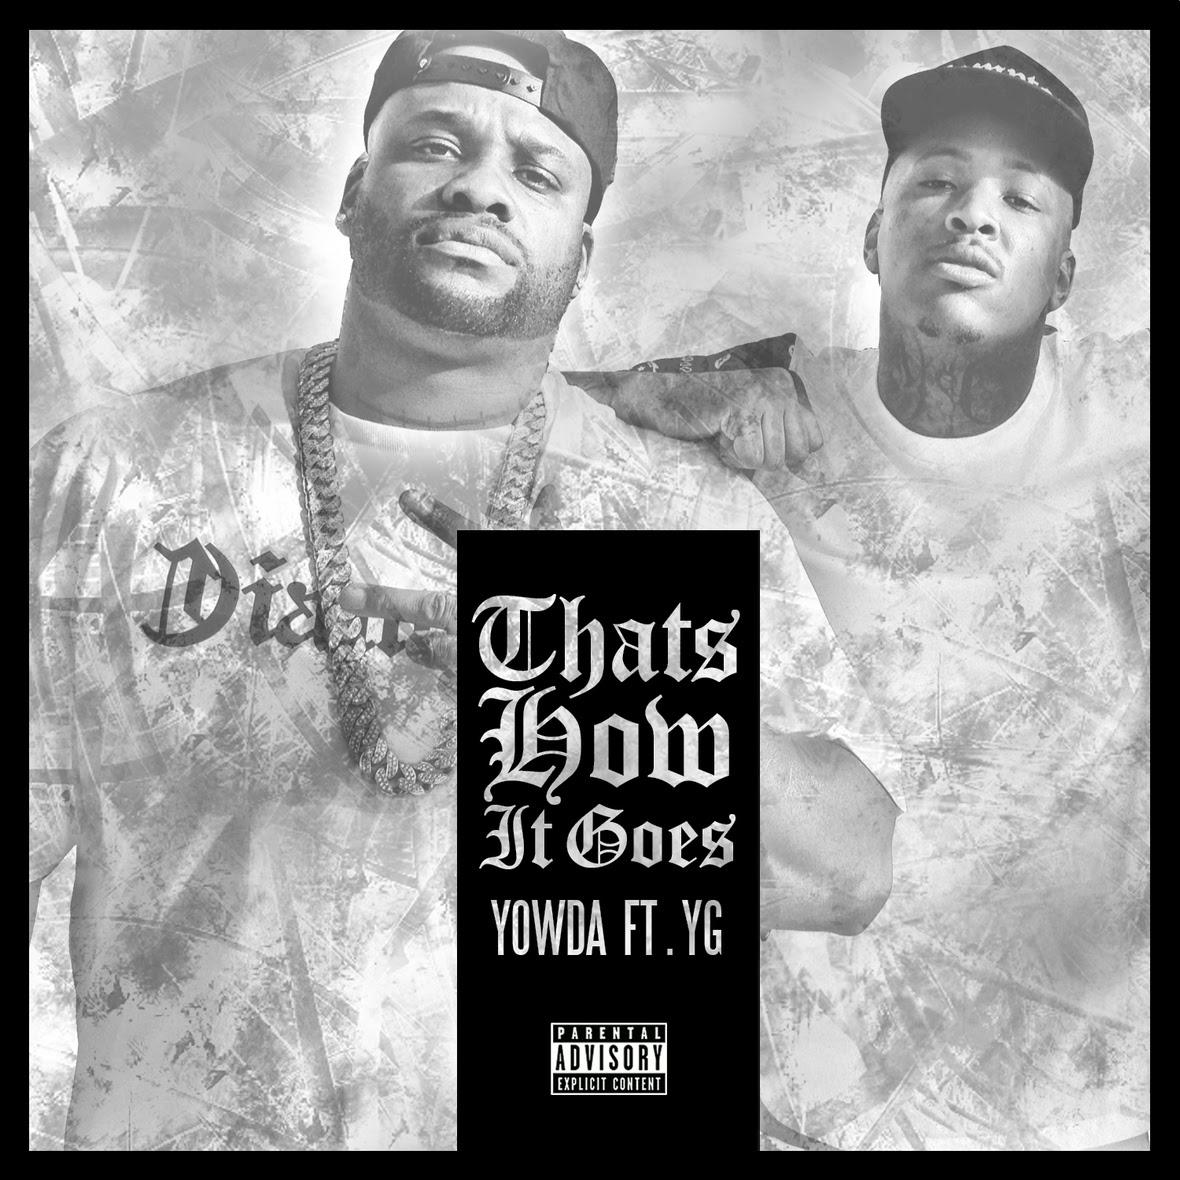 Yowda ft YG - That s How It Goes artwork